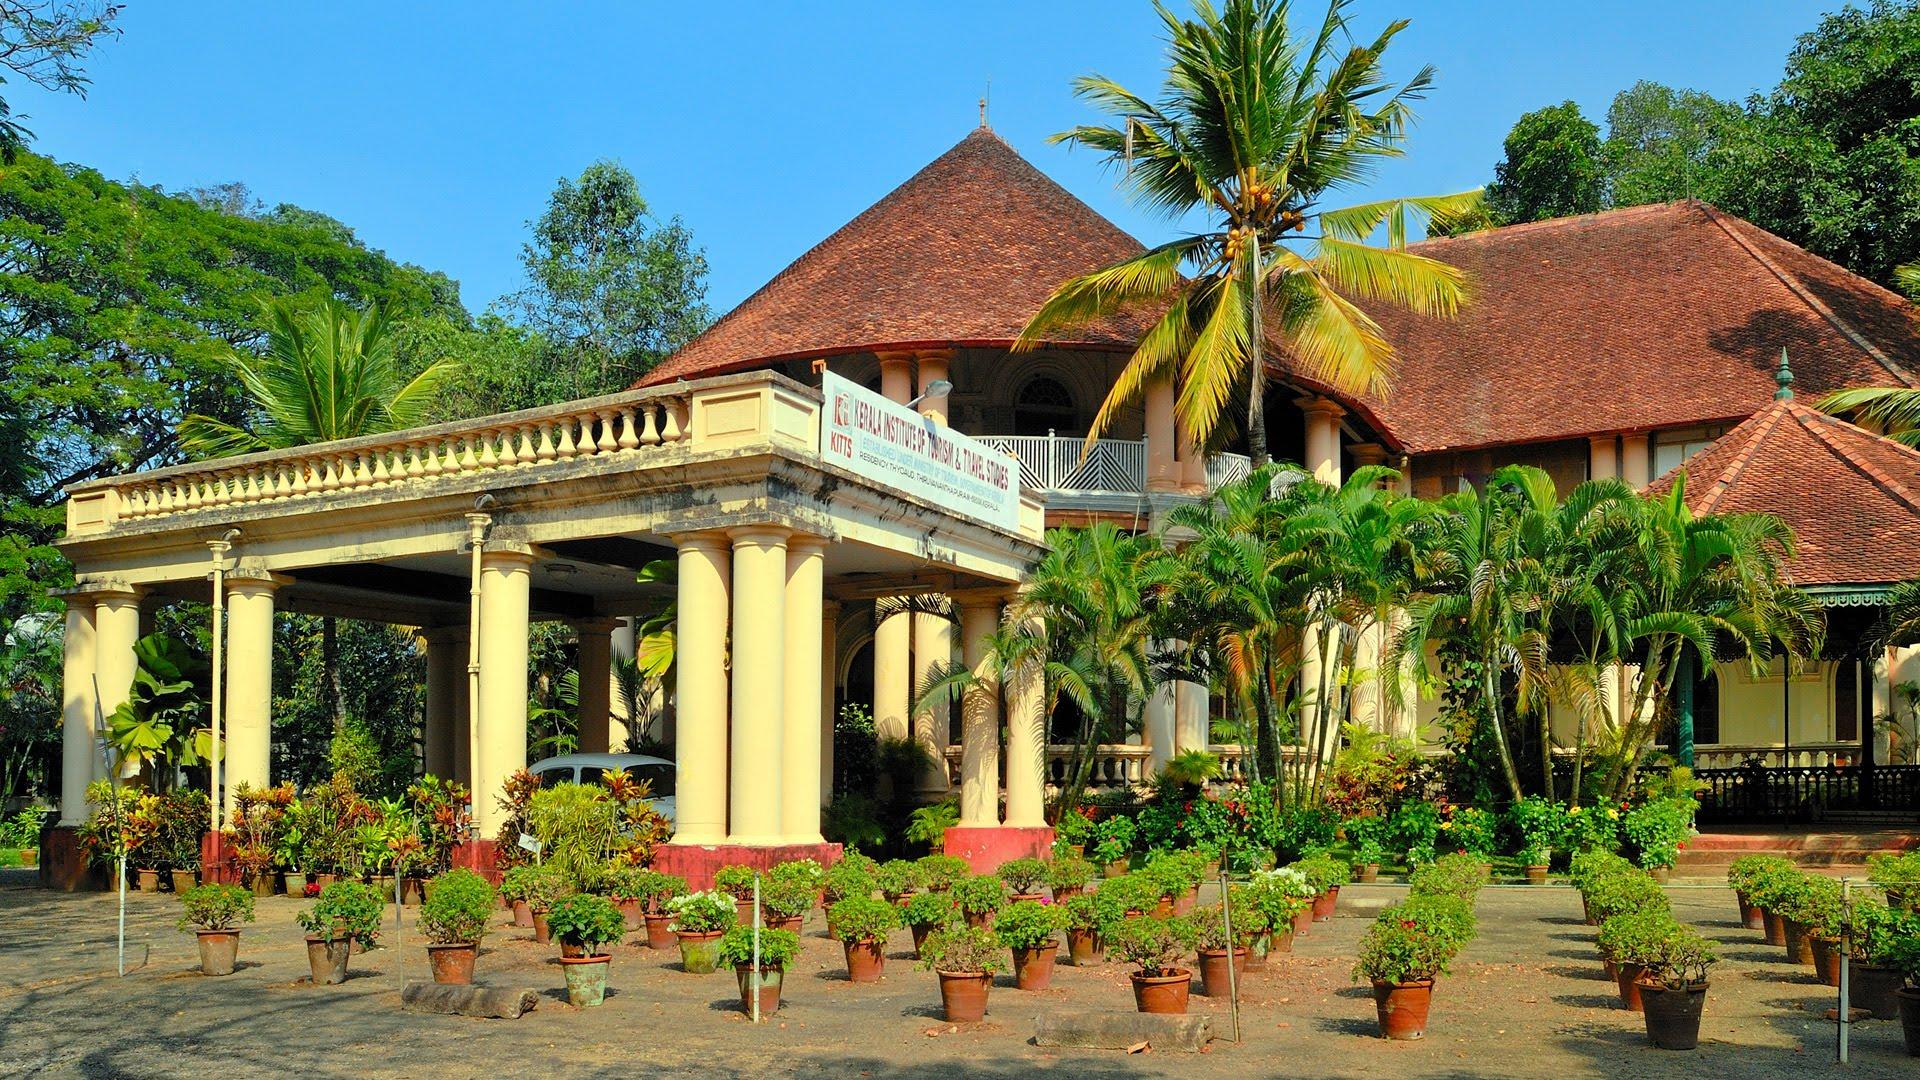 Kerala Institute of Tourism and Travel Studies, Thiruvananthapuram Image